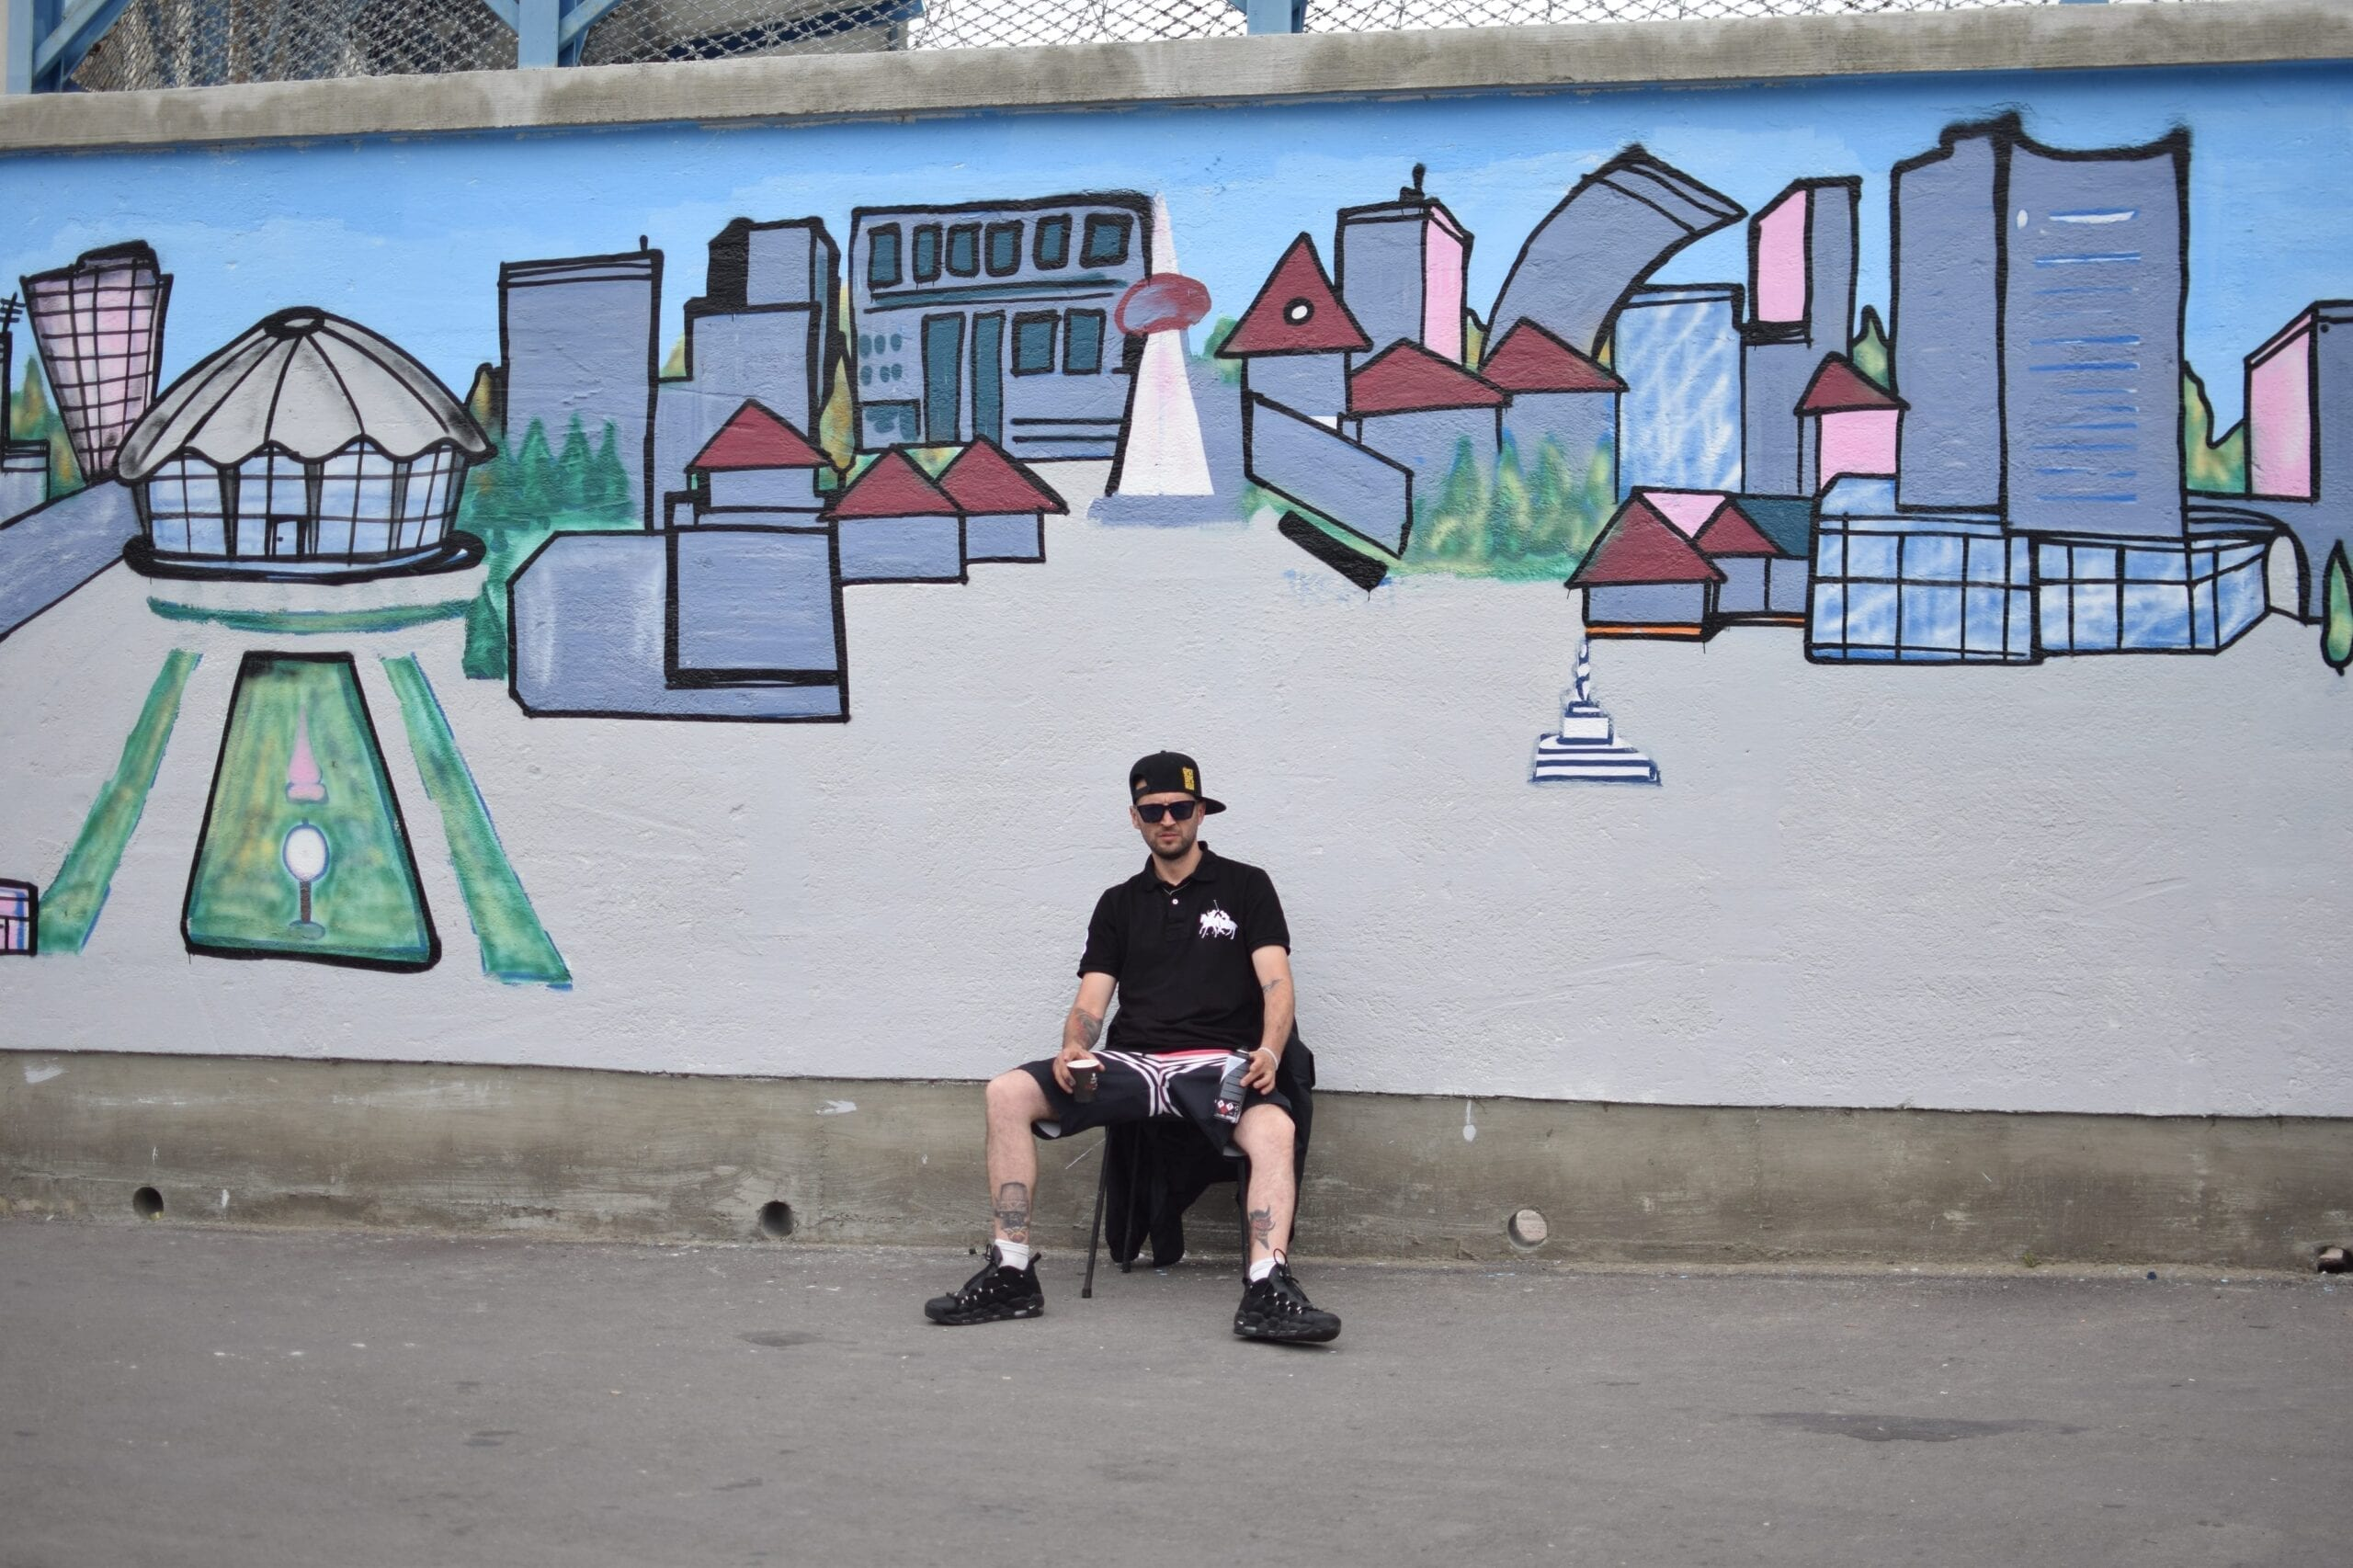 ERPS Street Delivery penitenciarul Iași 2018 Un-hidden street art in Romania book art files